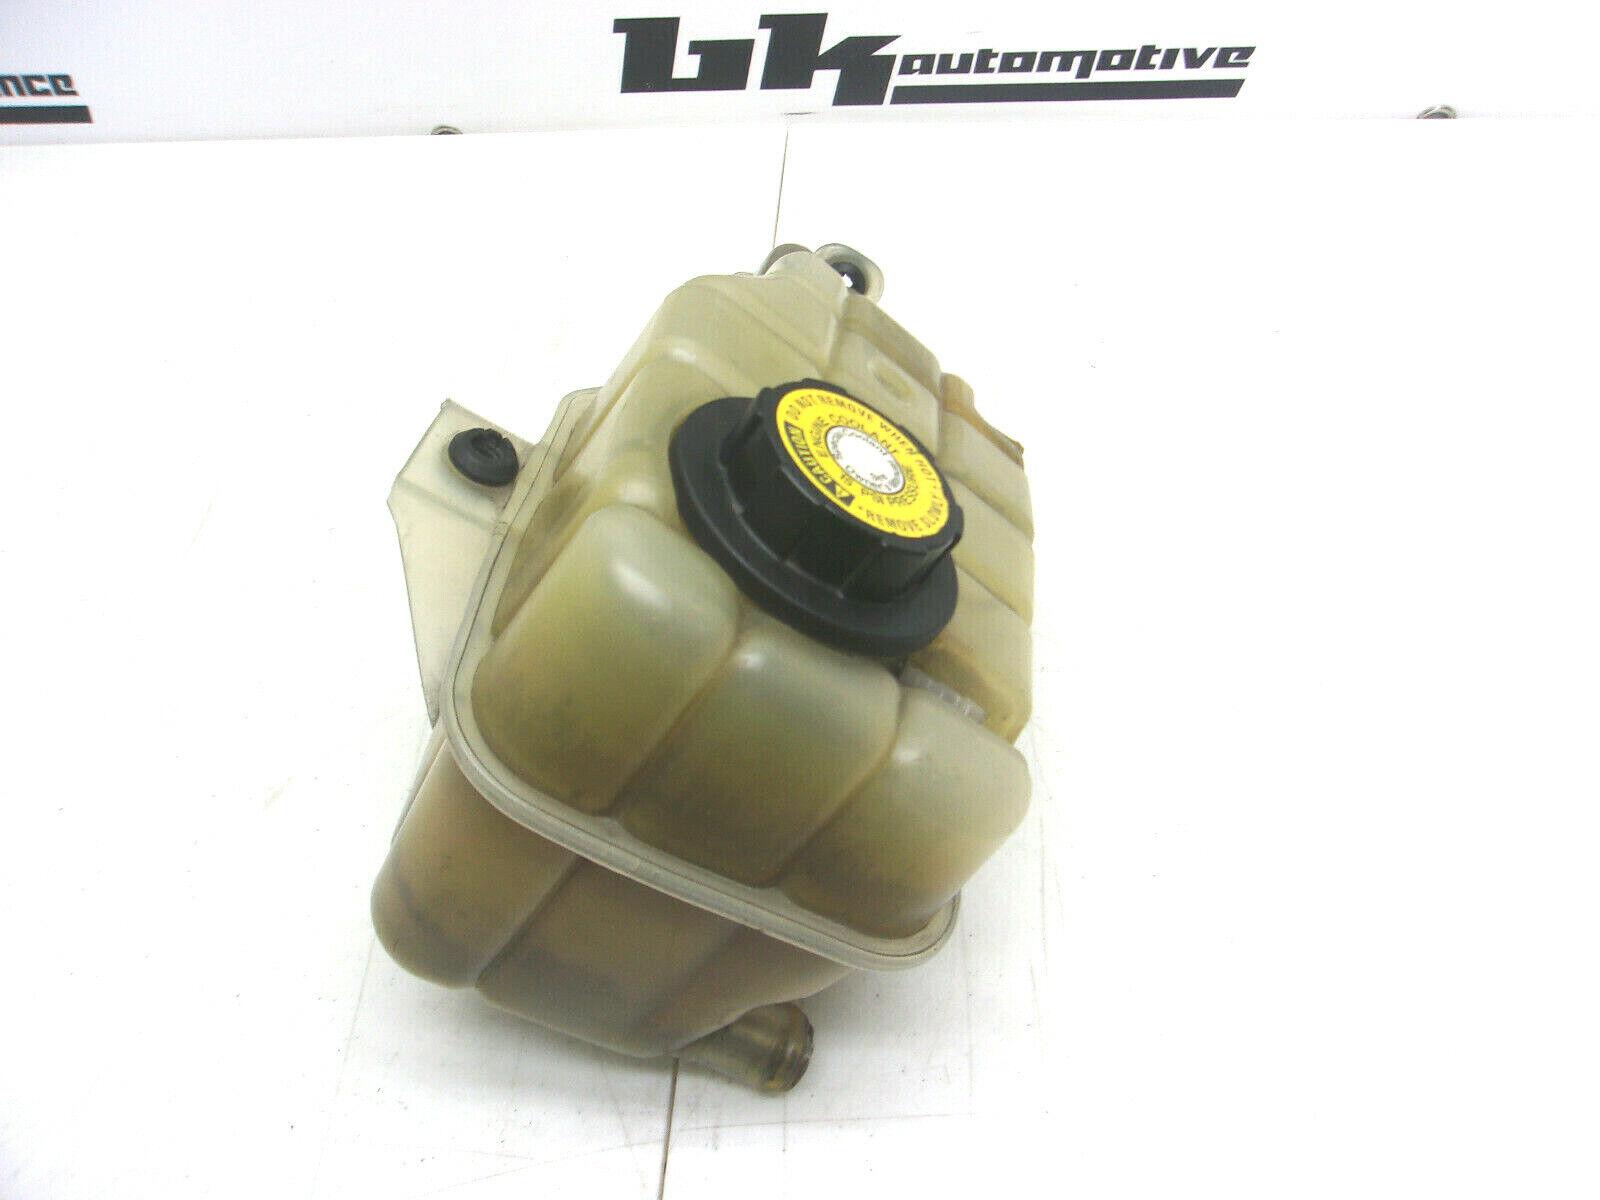 Gates Coolant Thermostat for 1966-1993 Chevrolet Caprice 5.4L 7.0L 5.0L 6.5L mv